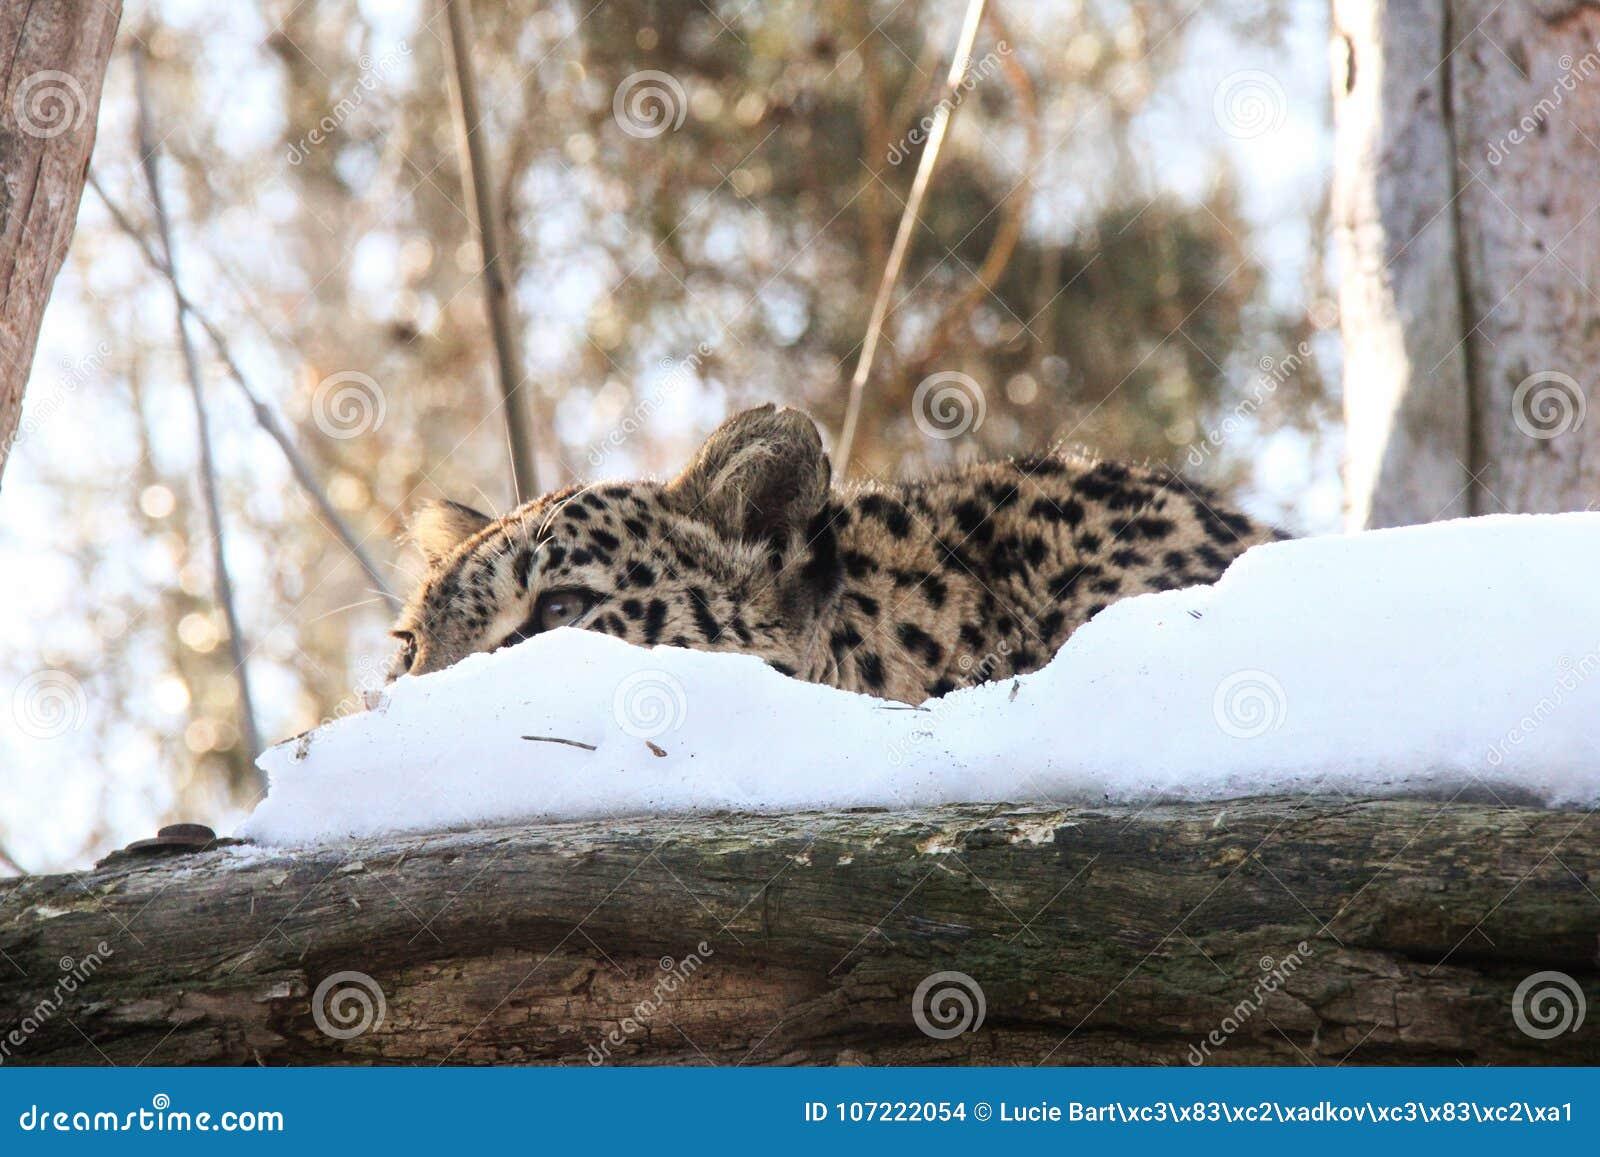 Hidden Leopard Stock Photo Image Of Mammal Cute Carnivore